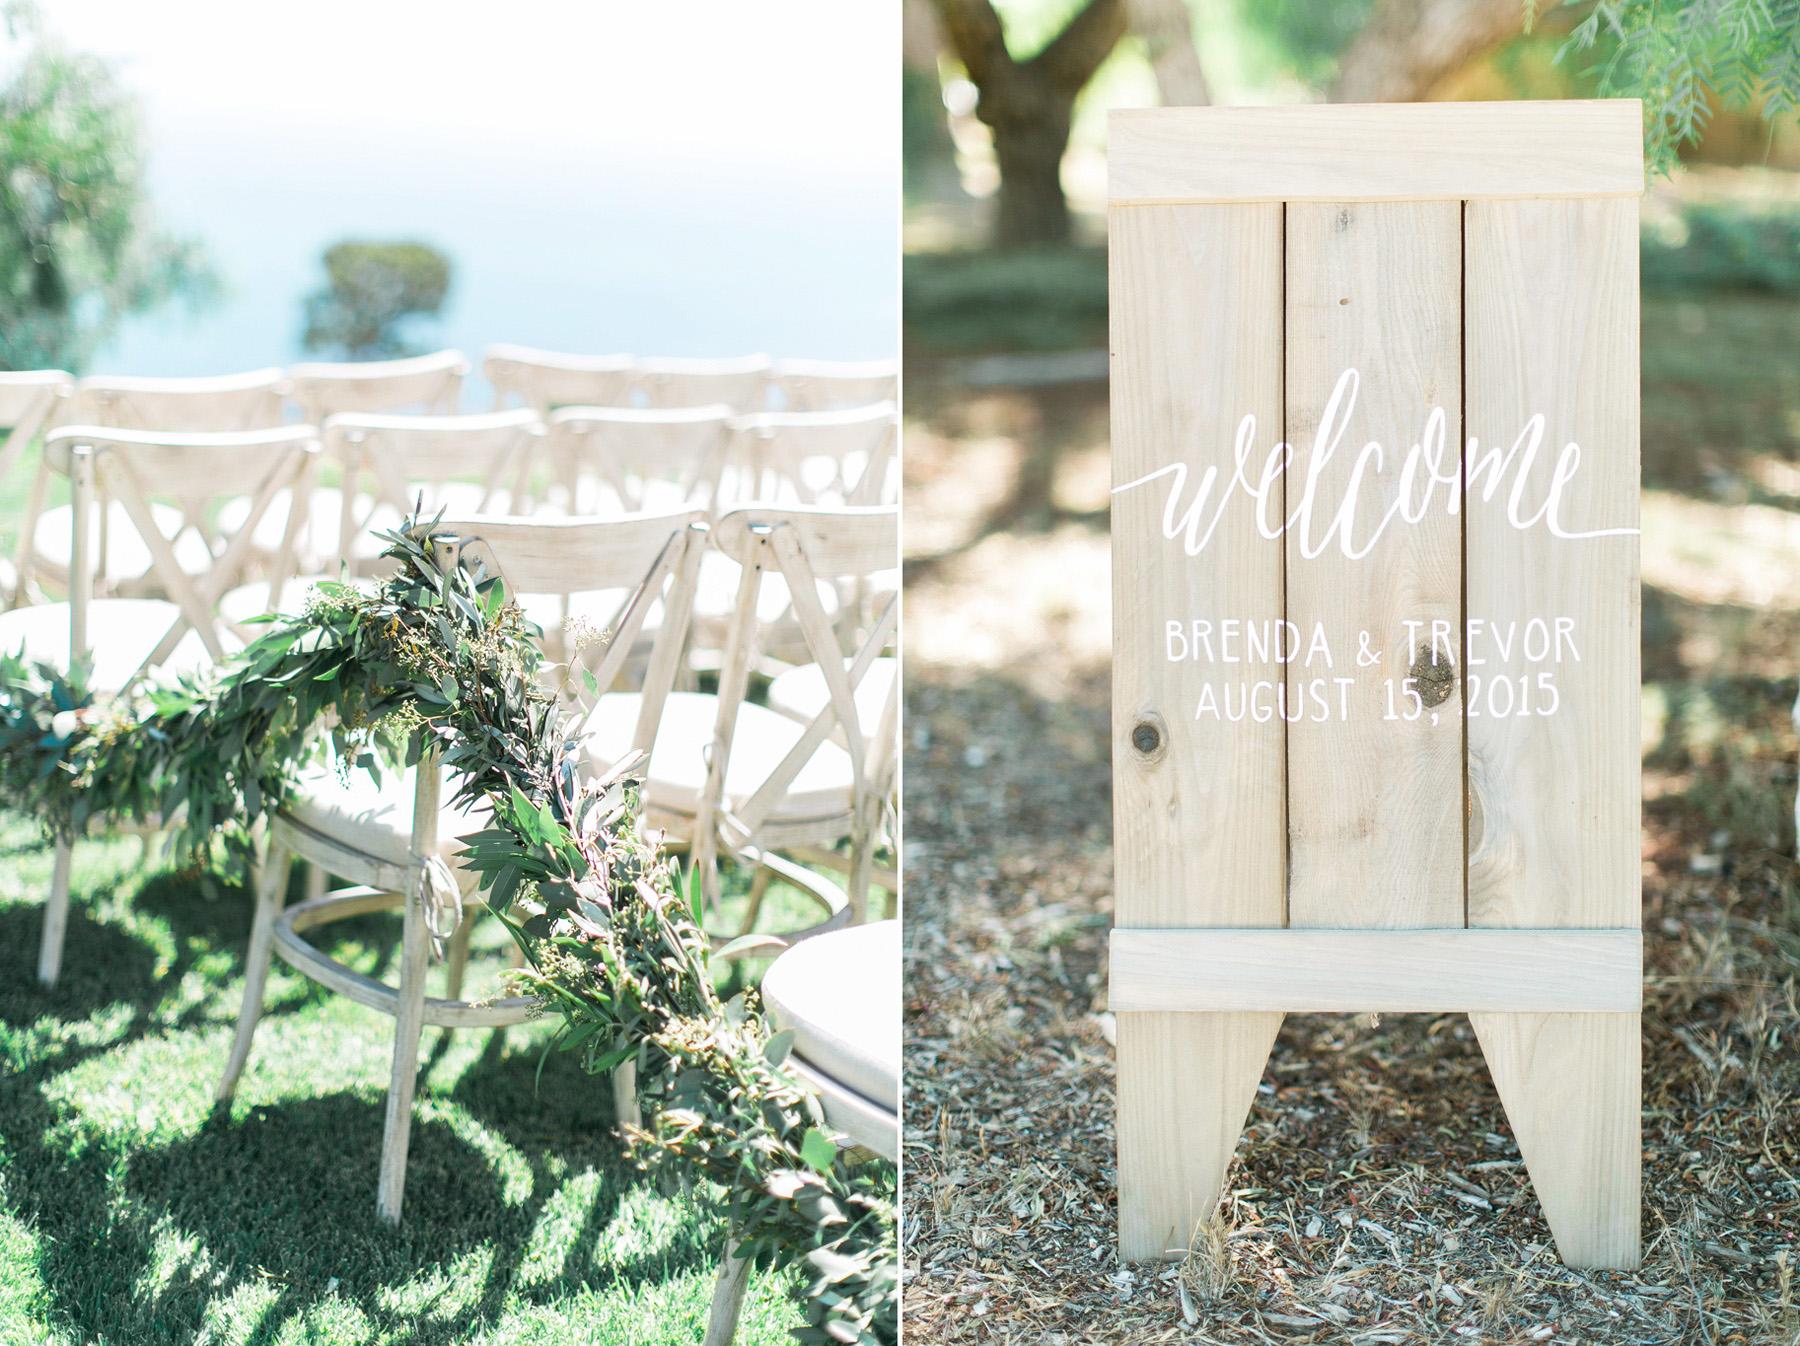 Catalina-View-Gardens-Wedding-20